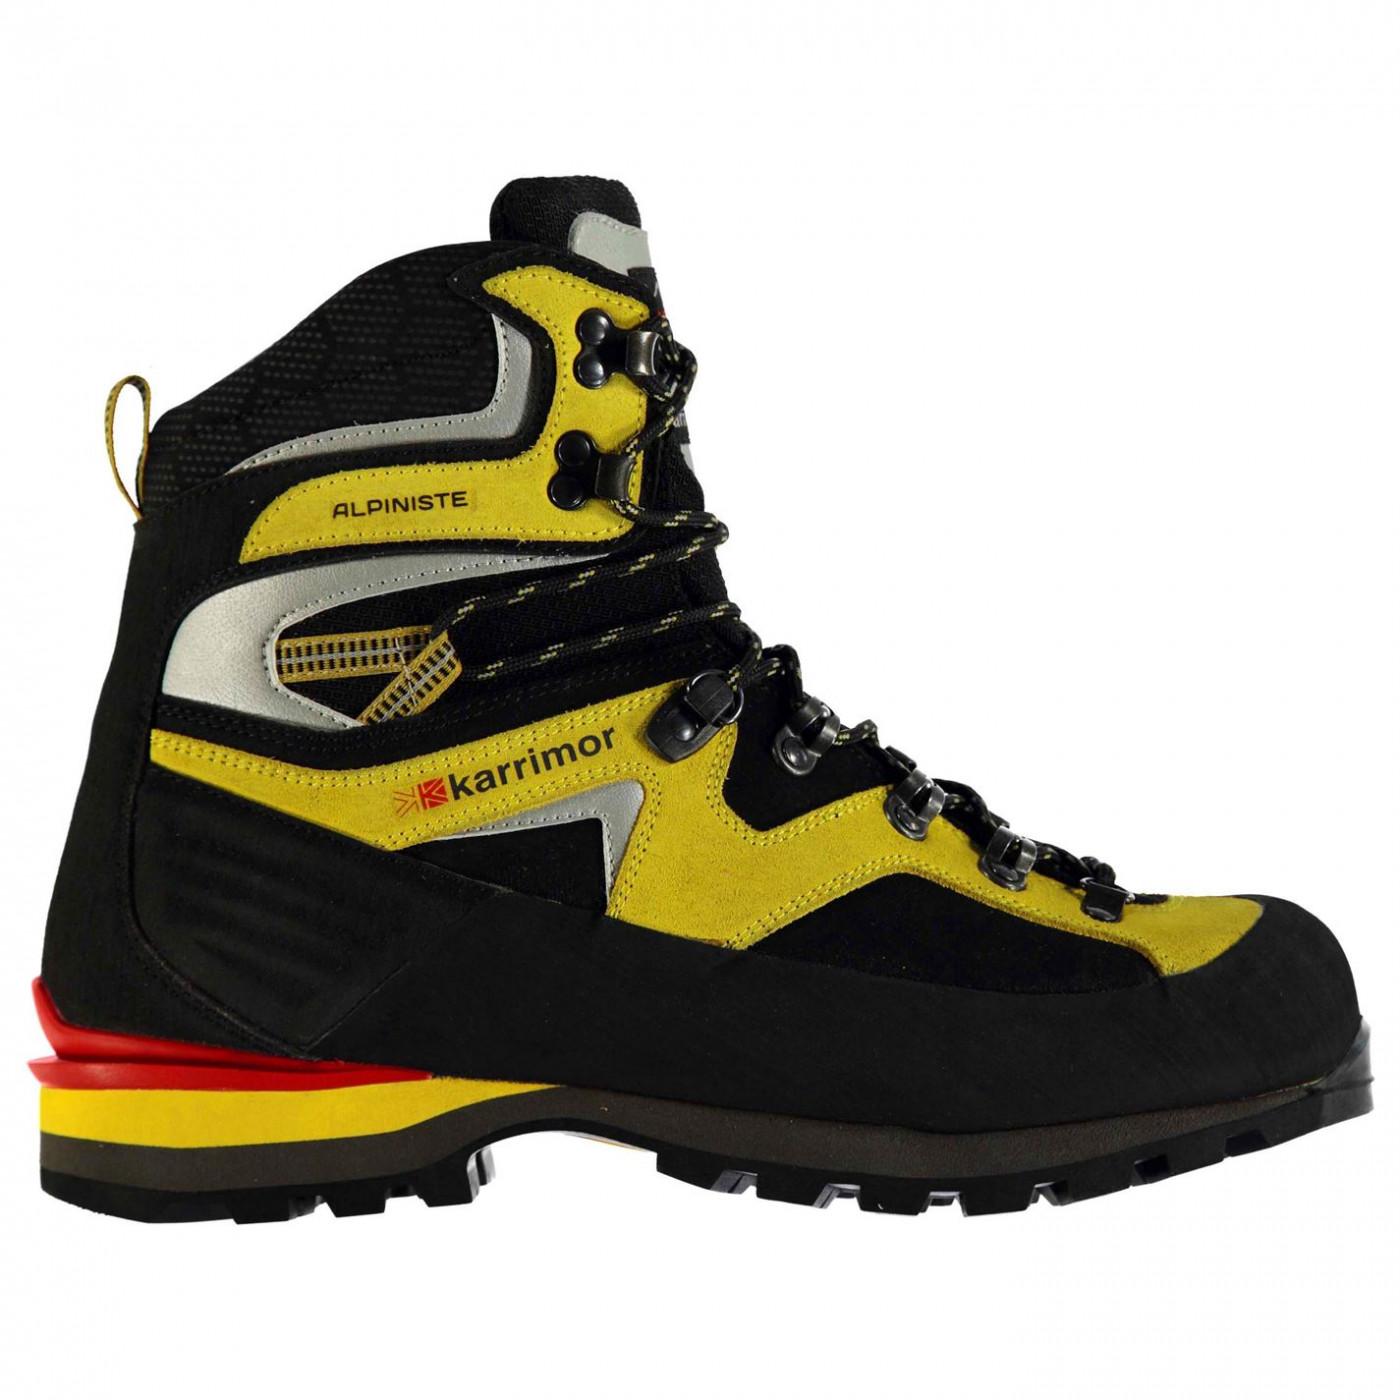 Pánska trekové topánky Karrimor Alpiniste Mountain Boots